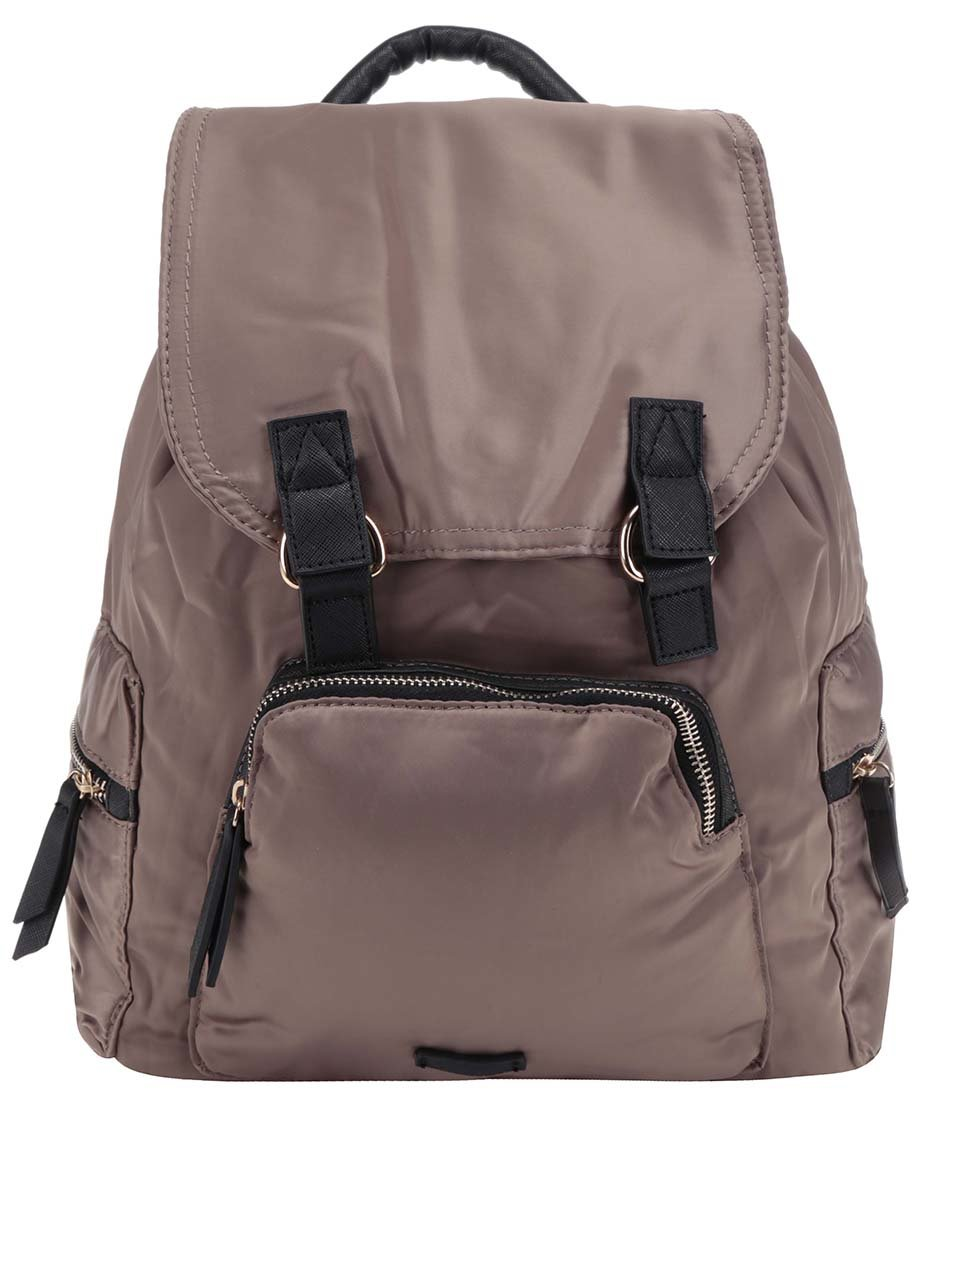 Hnědý batoh Haily's Bomba